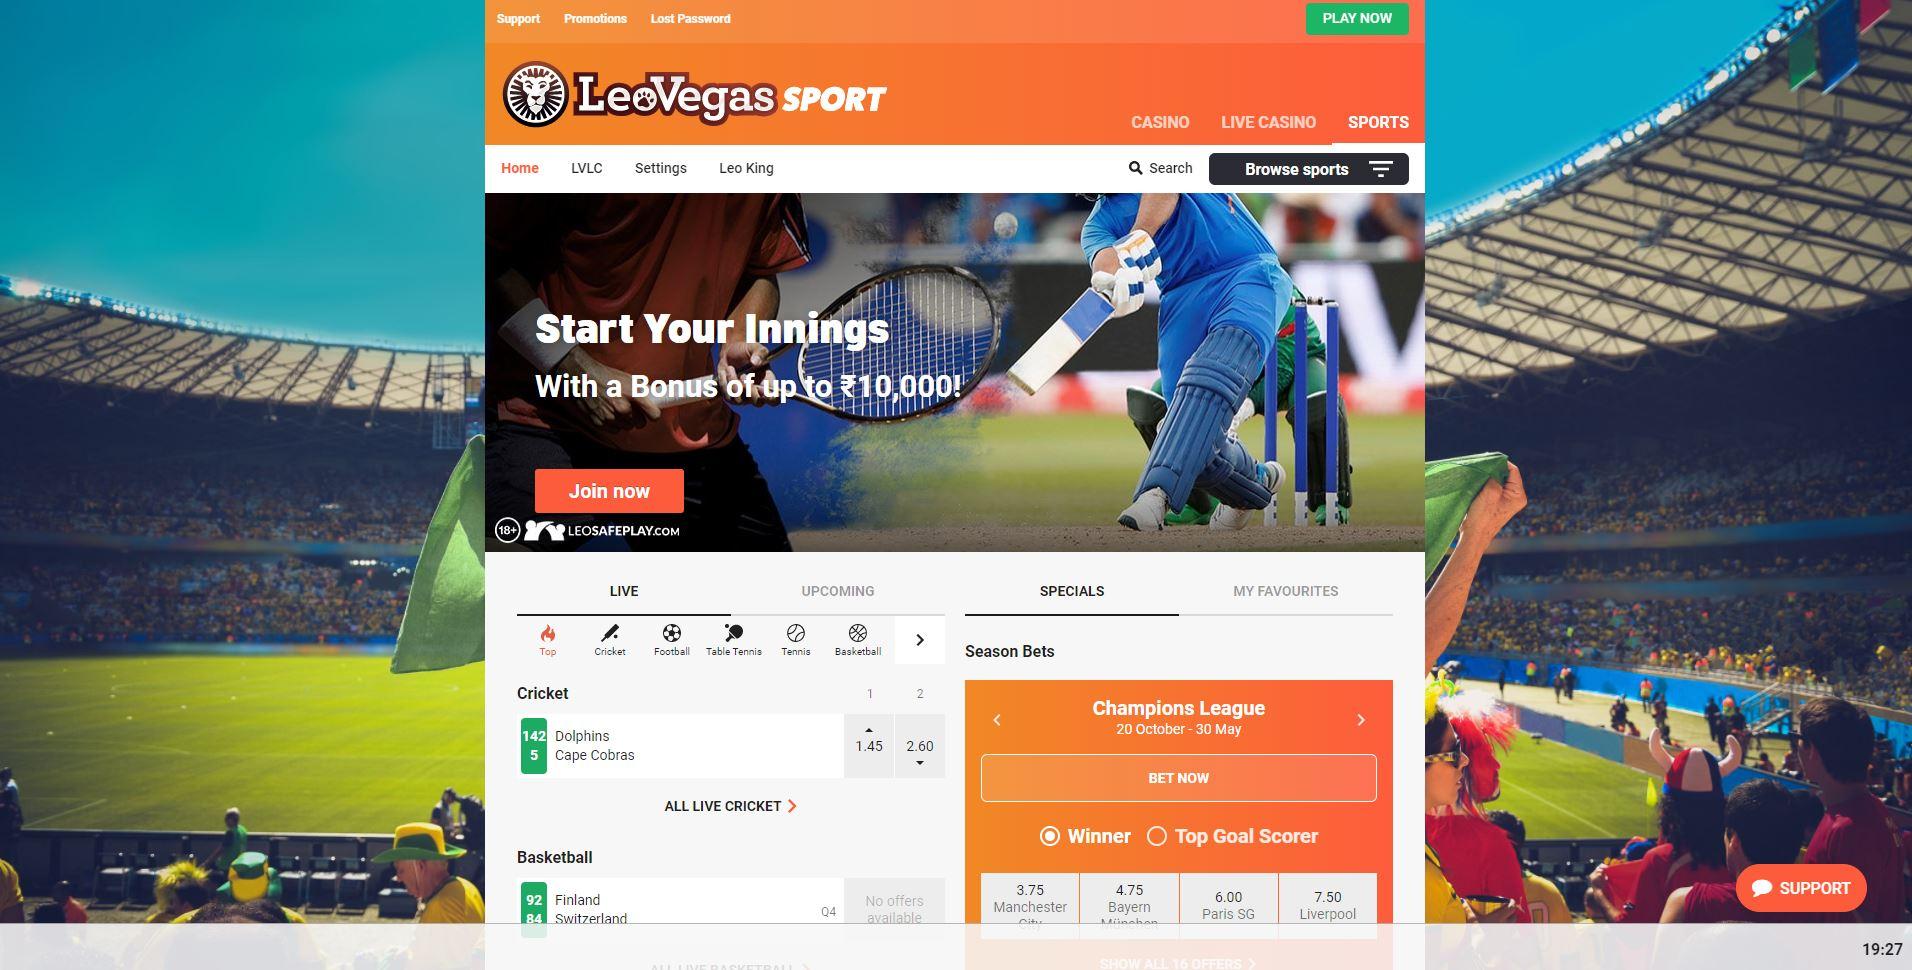 LeoVegas Sportsbook Review